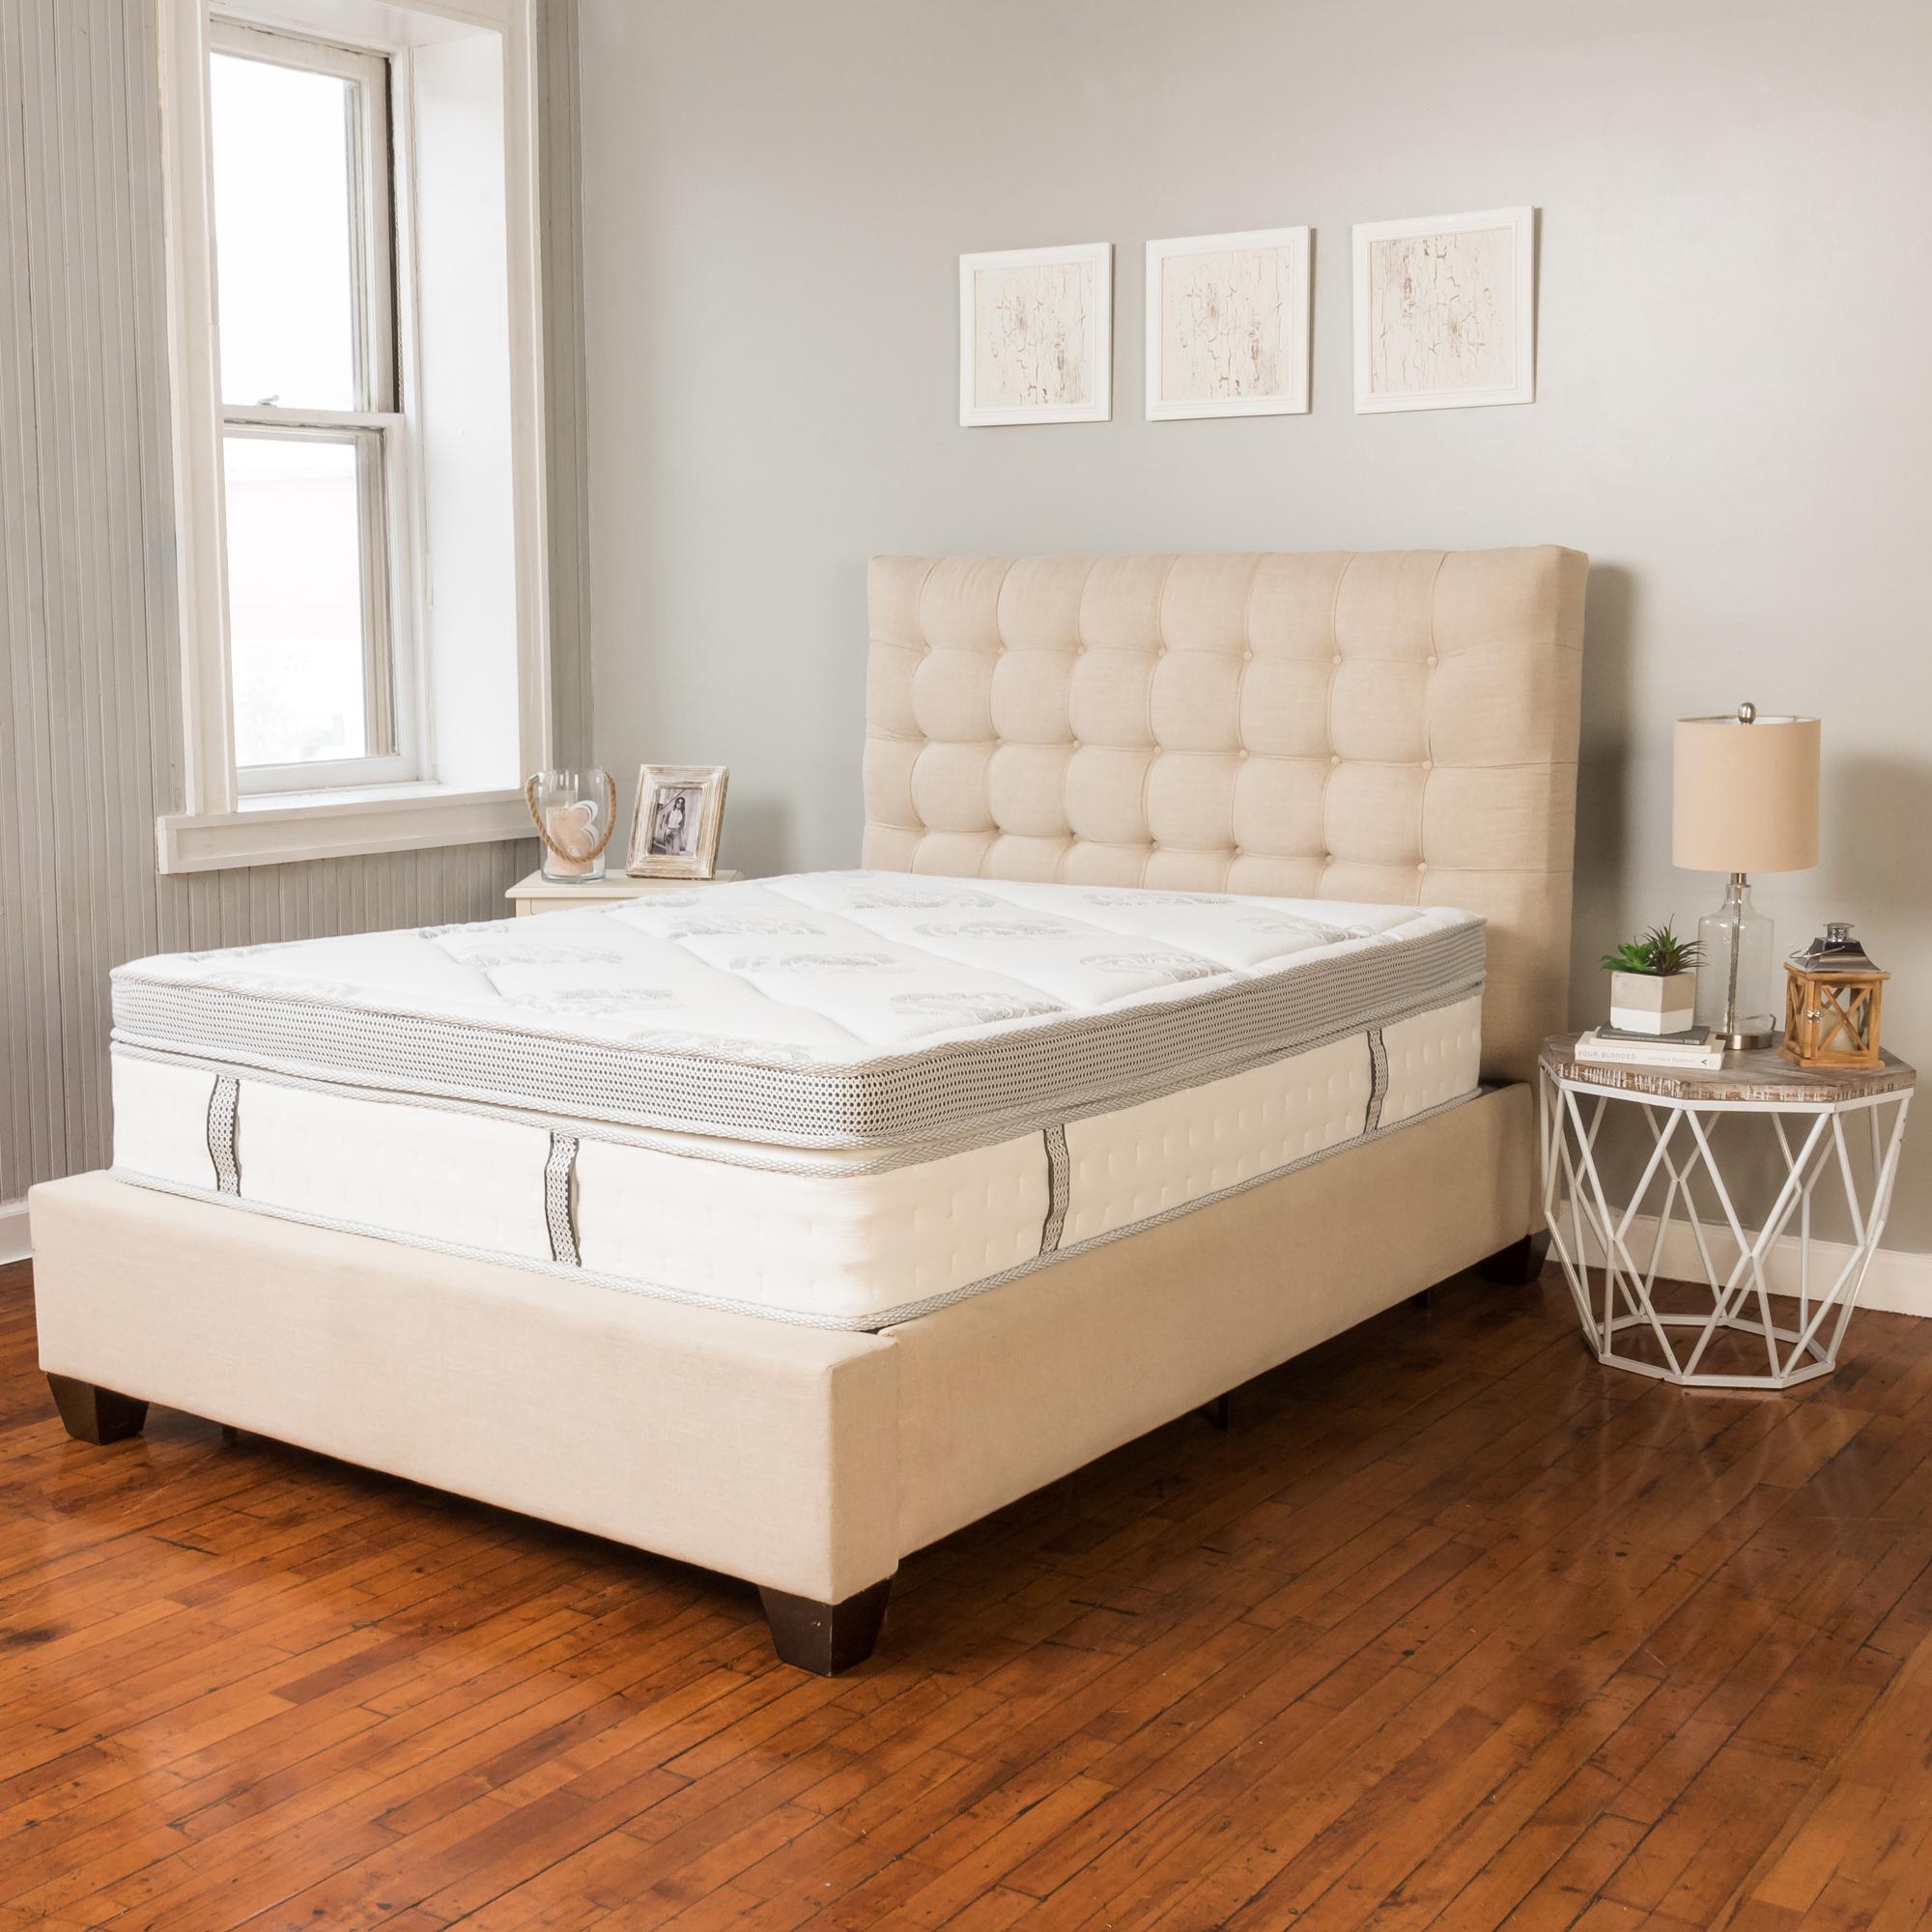 Modern Sleep Gramercy Euro-Top Cool Gel Memory Foam and Innerspring Hybrid 14-Inch... by Classic Brands